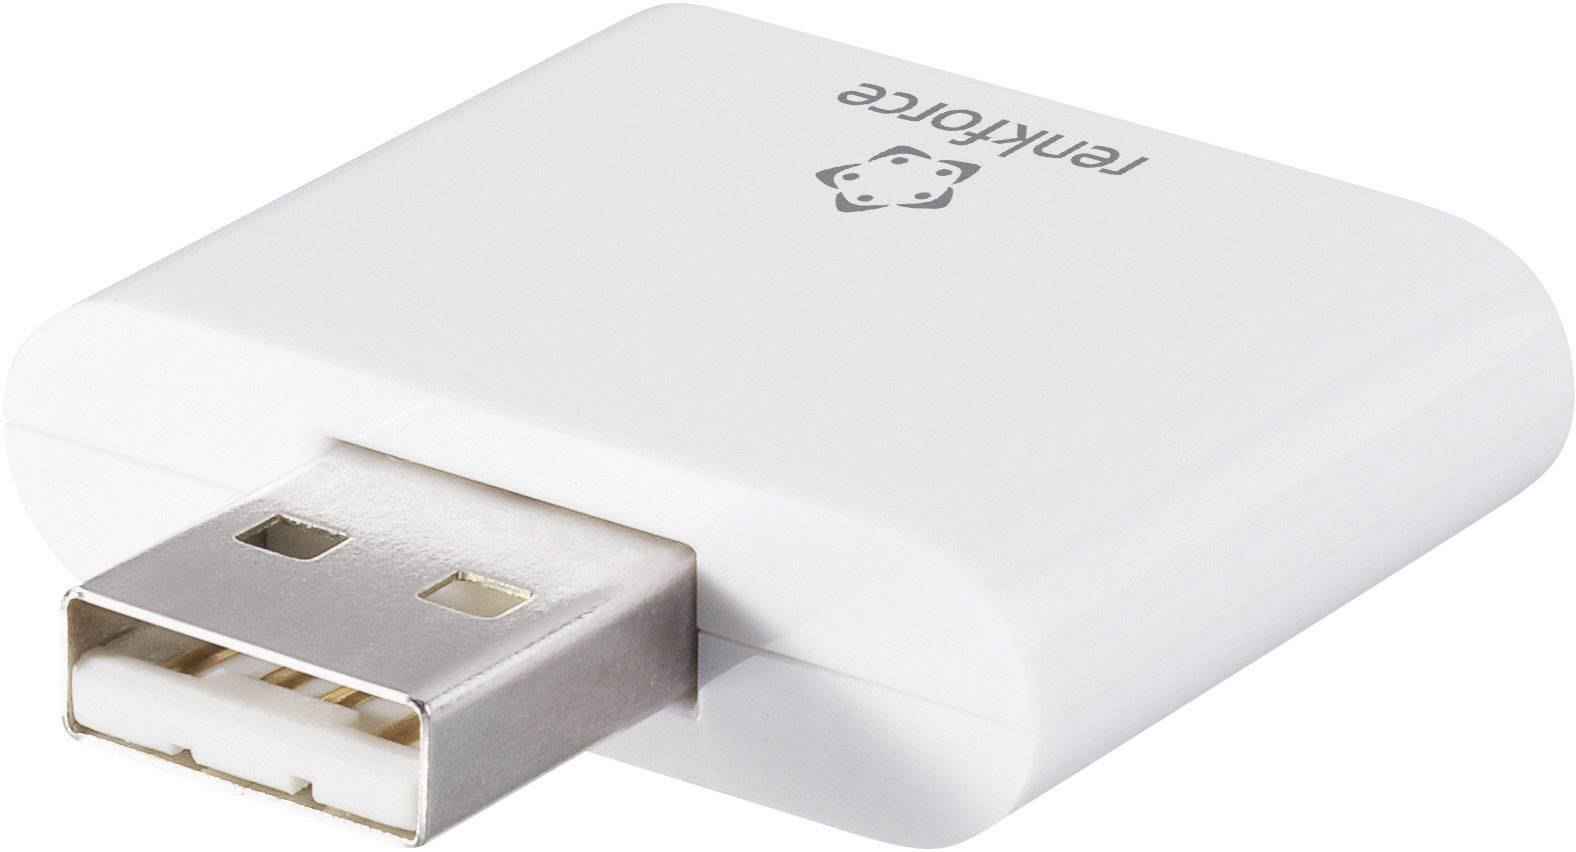 Externá čítačka pamäťových kariet Renkforce CR20-K, USB 2.0, biela